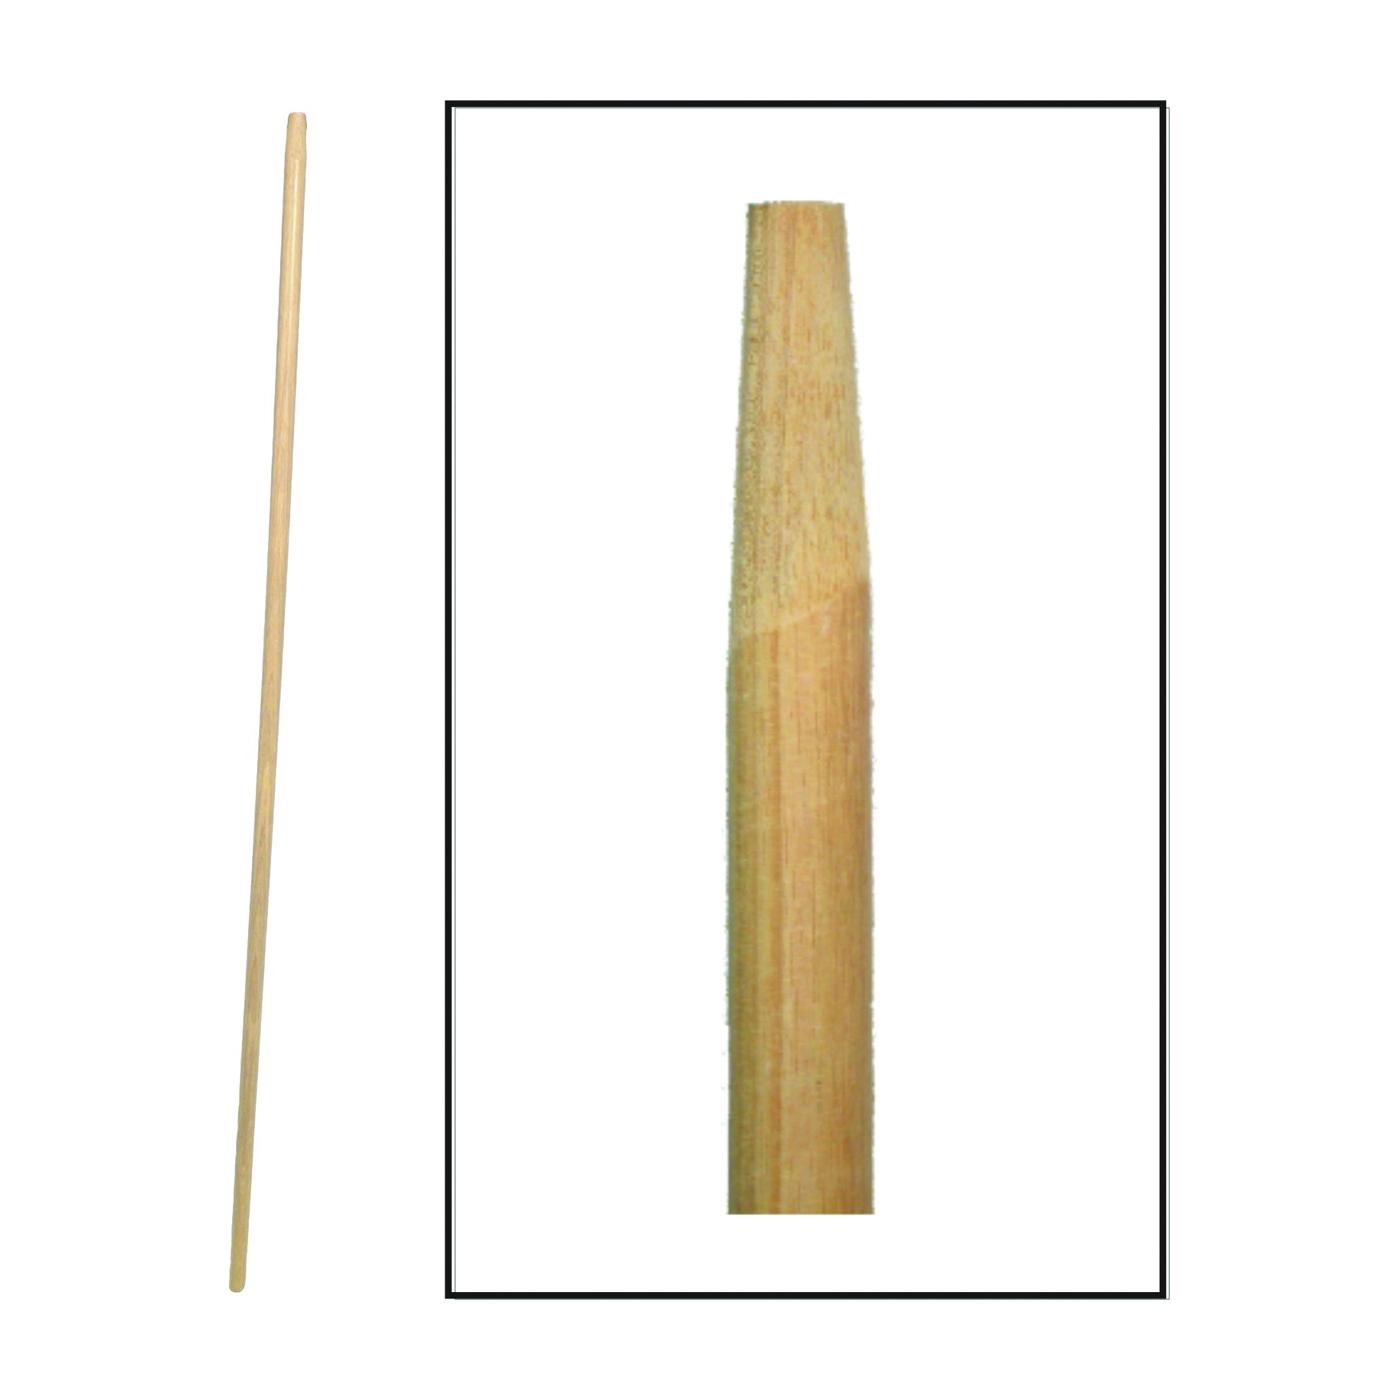 Picture of BIRDWELL 521-12 Broom Handle, 15/16 in Dia, 60 in L, Hardwood